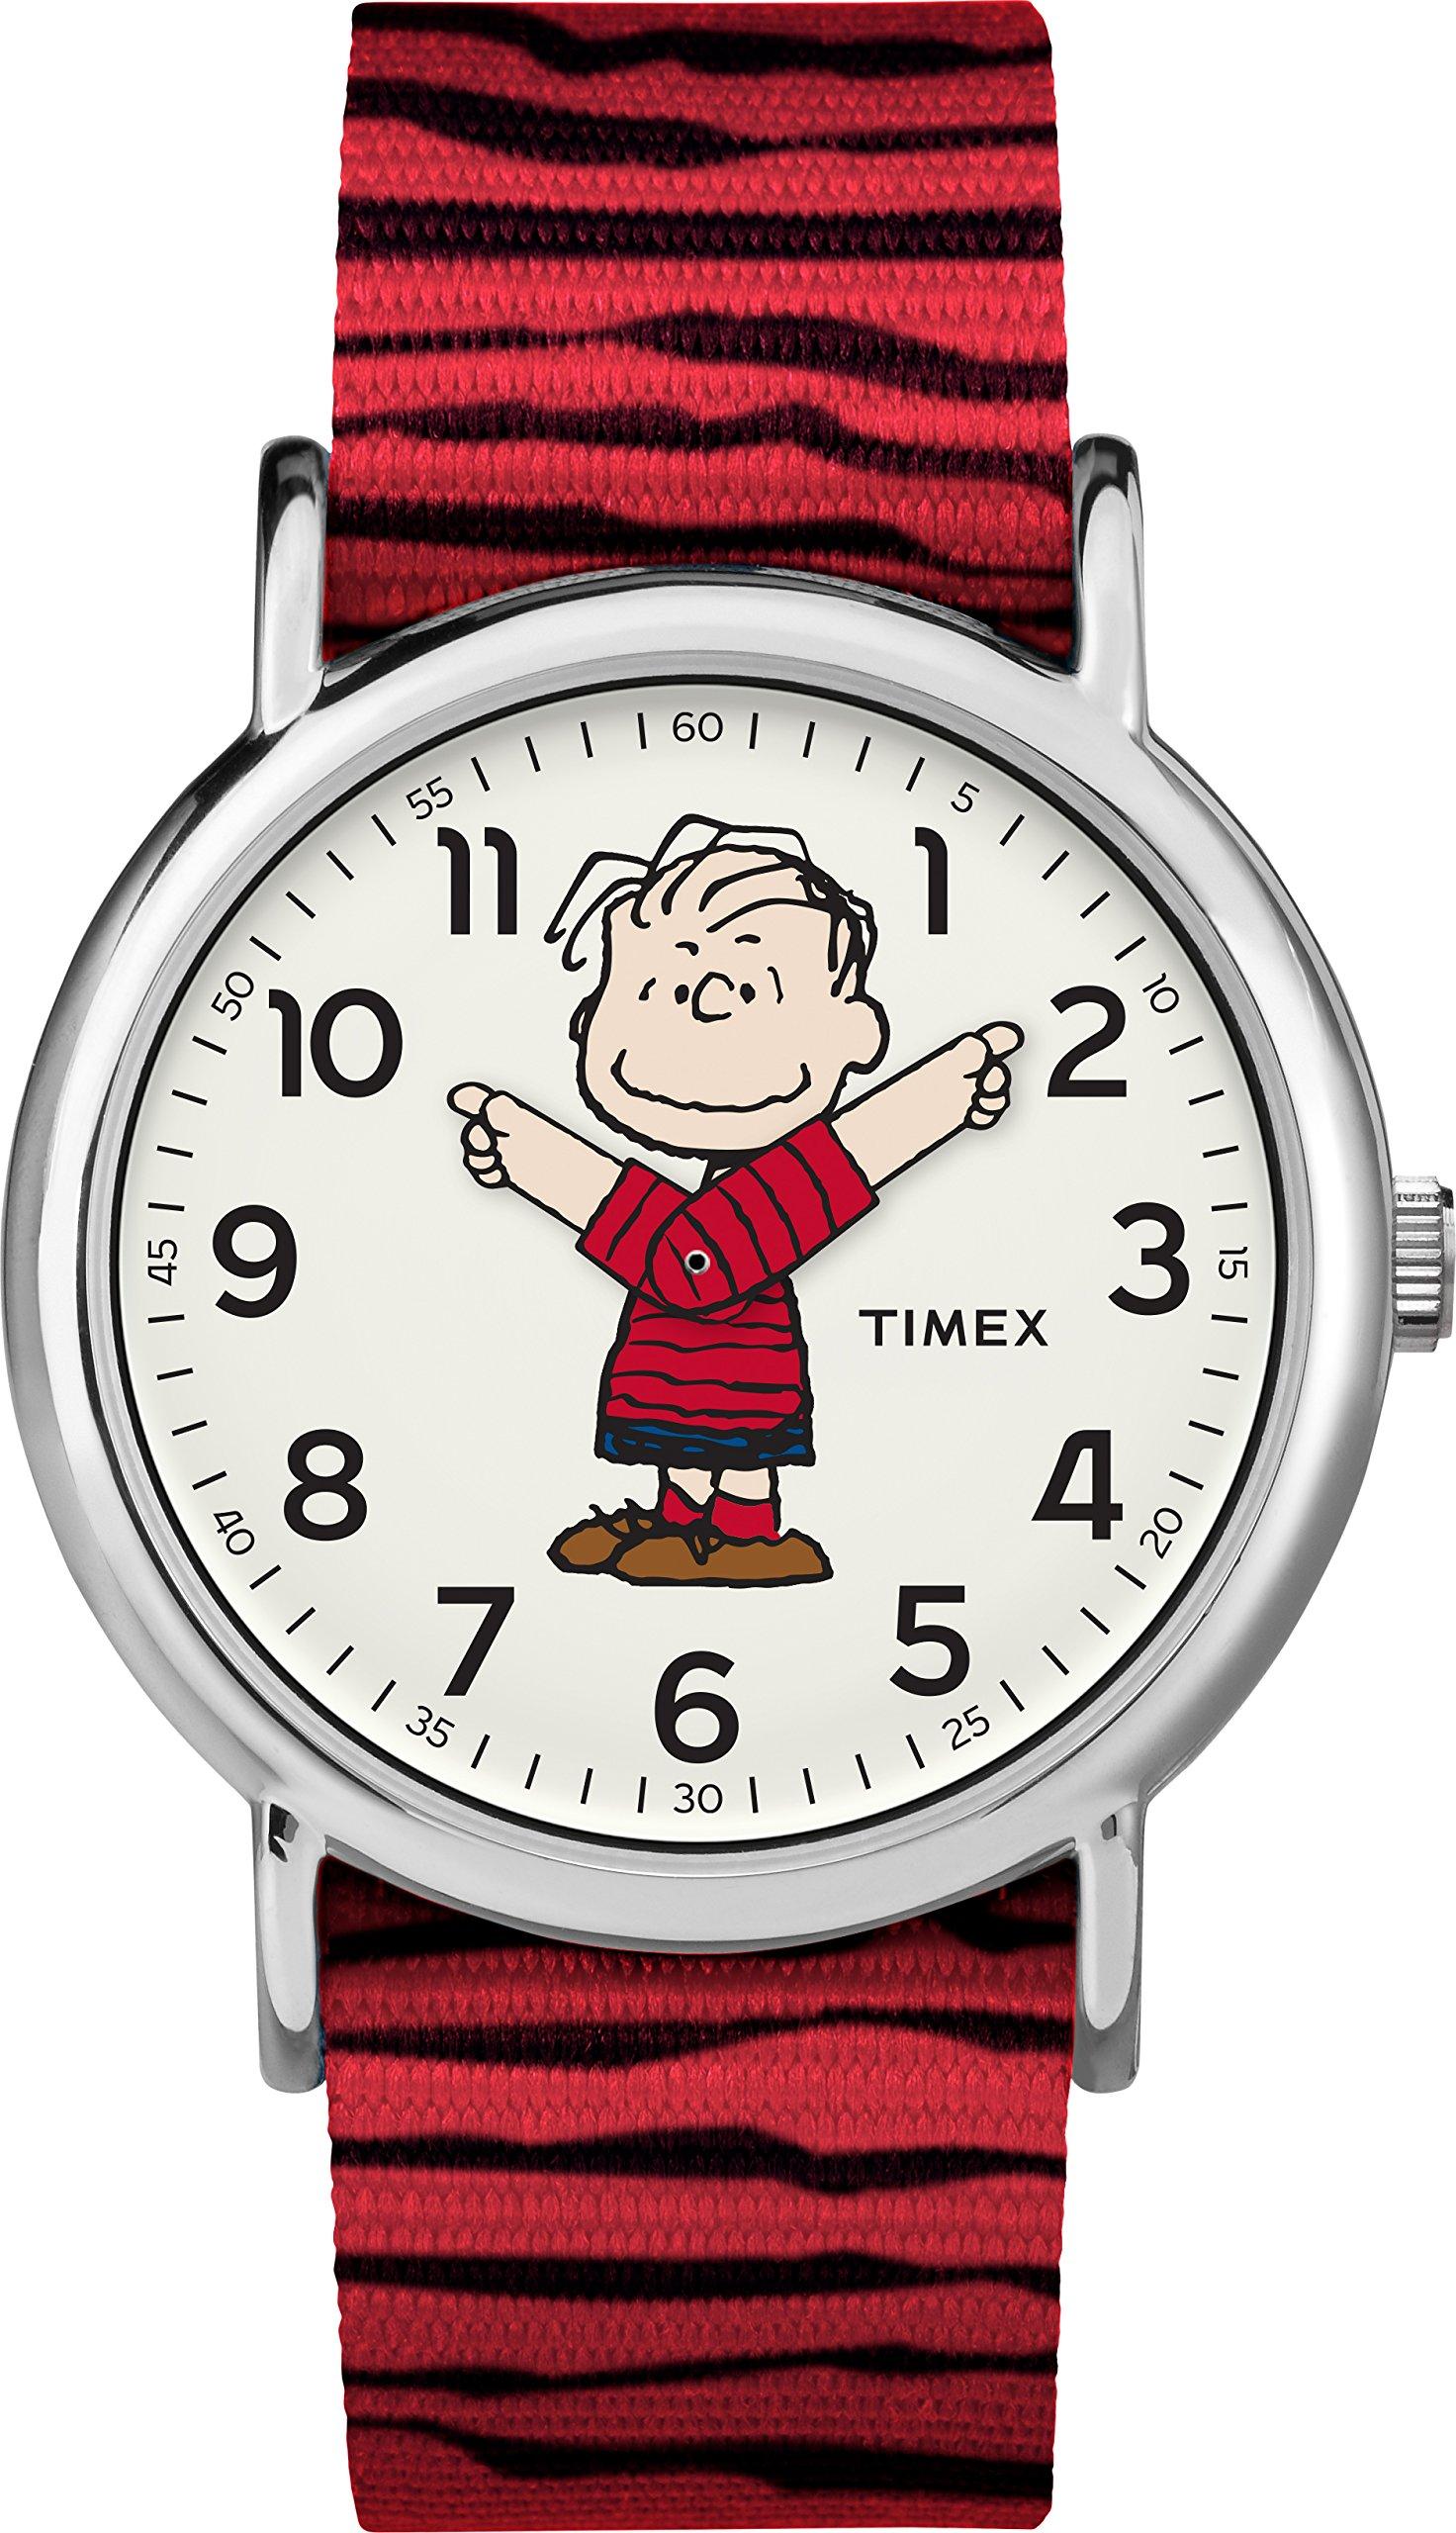 Timex x Peanuts Linus Unisex Watch TW2R412006B - Girls Watches by Timex